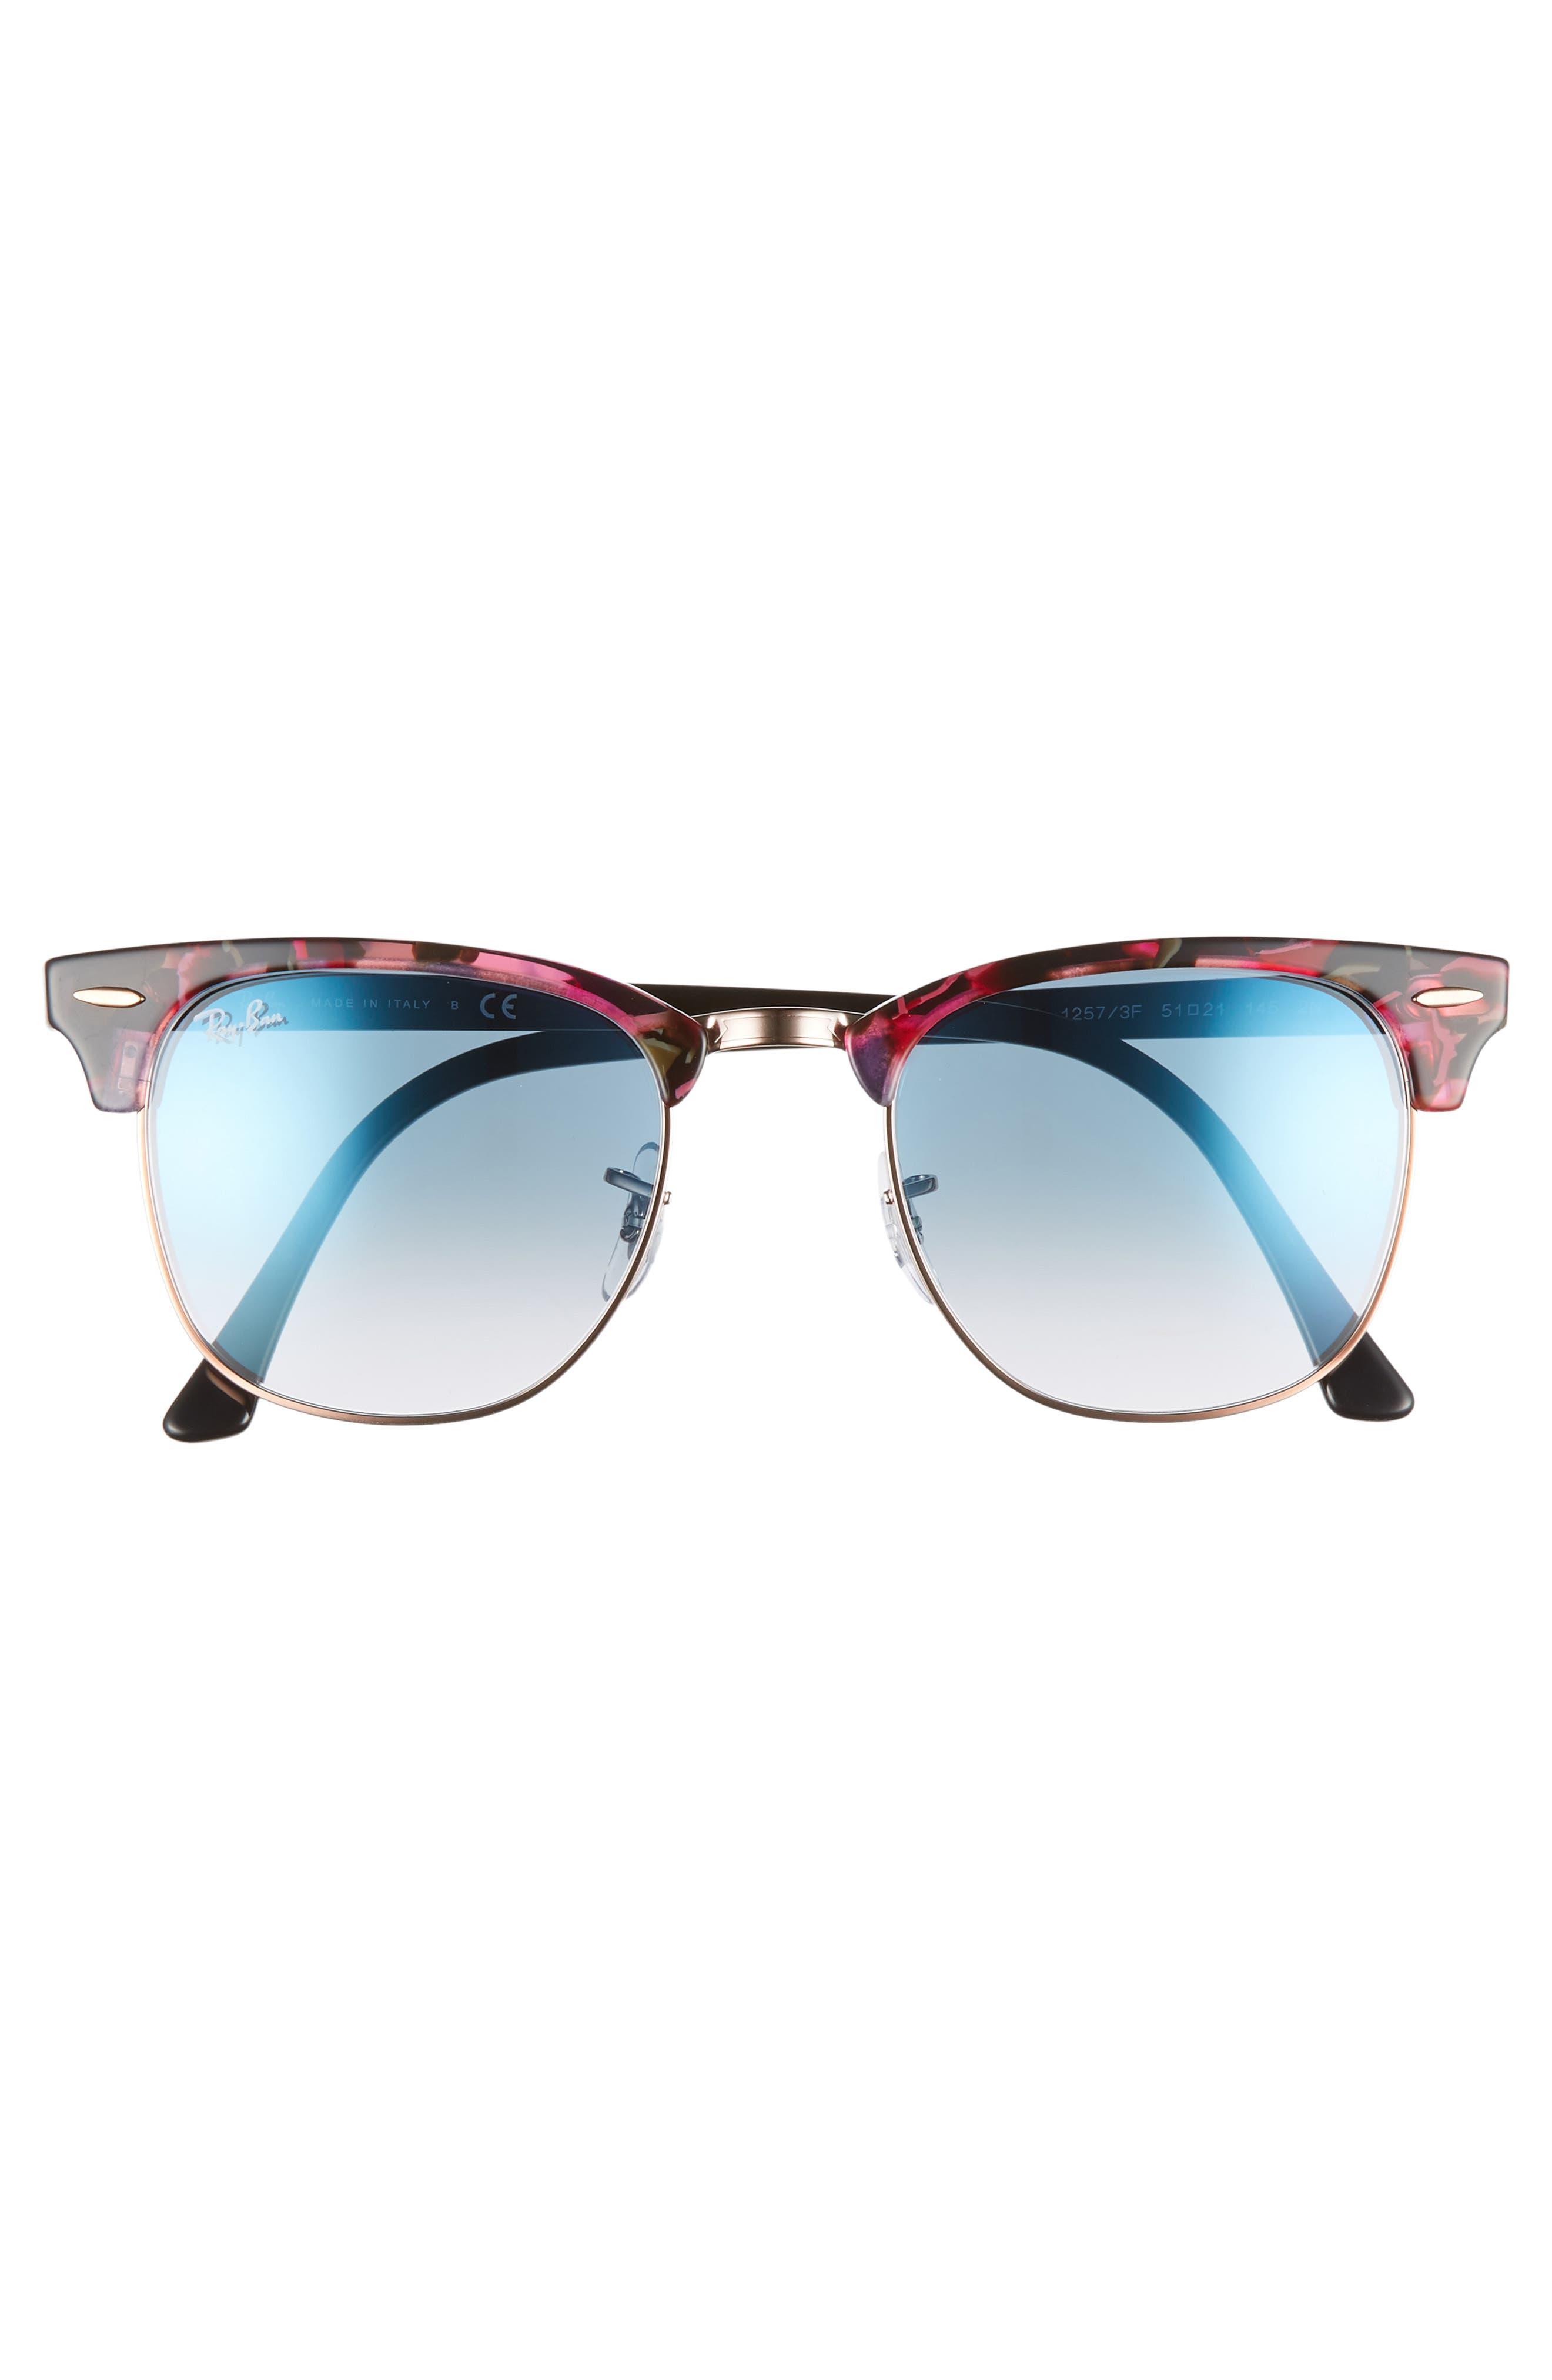 Clubmaster 51mm Gradient Sunglasses,                             Alternate thumbnail 3, color,                             GREY/ VIOLET GRADIENT